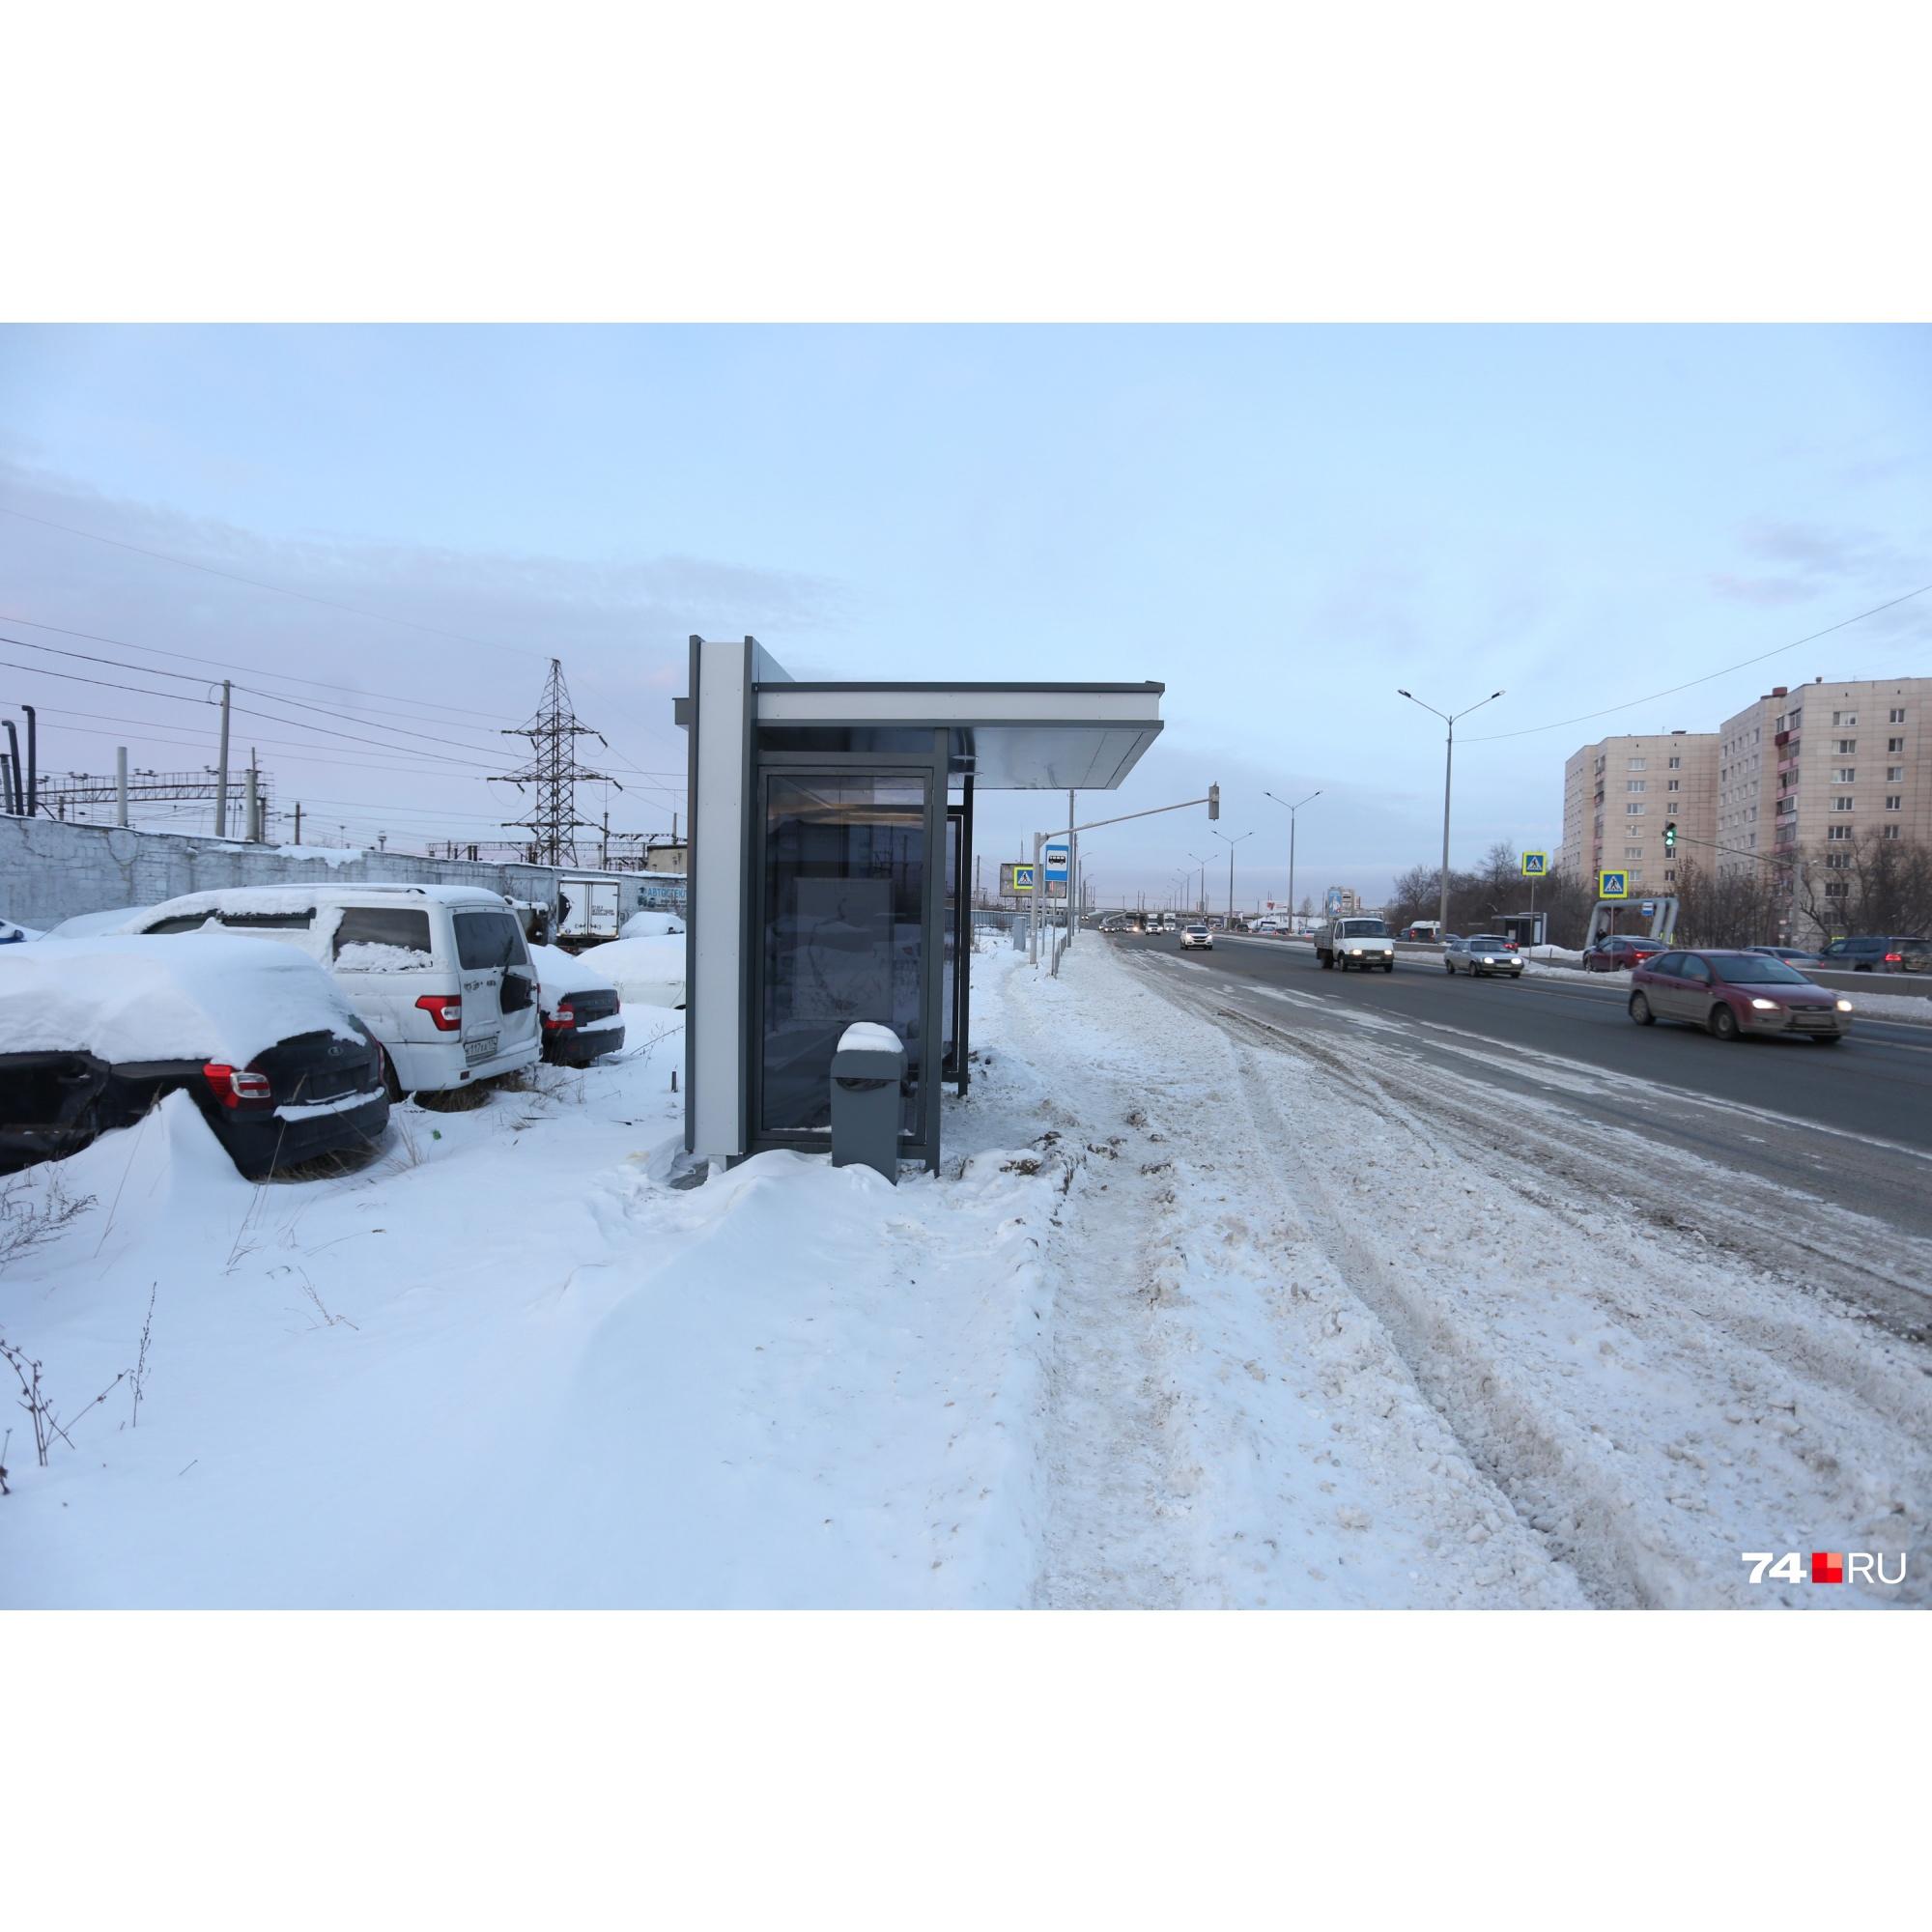 На остановке «Улица Гончаренко» на «Меридиане» — снежно и грустно